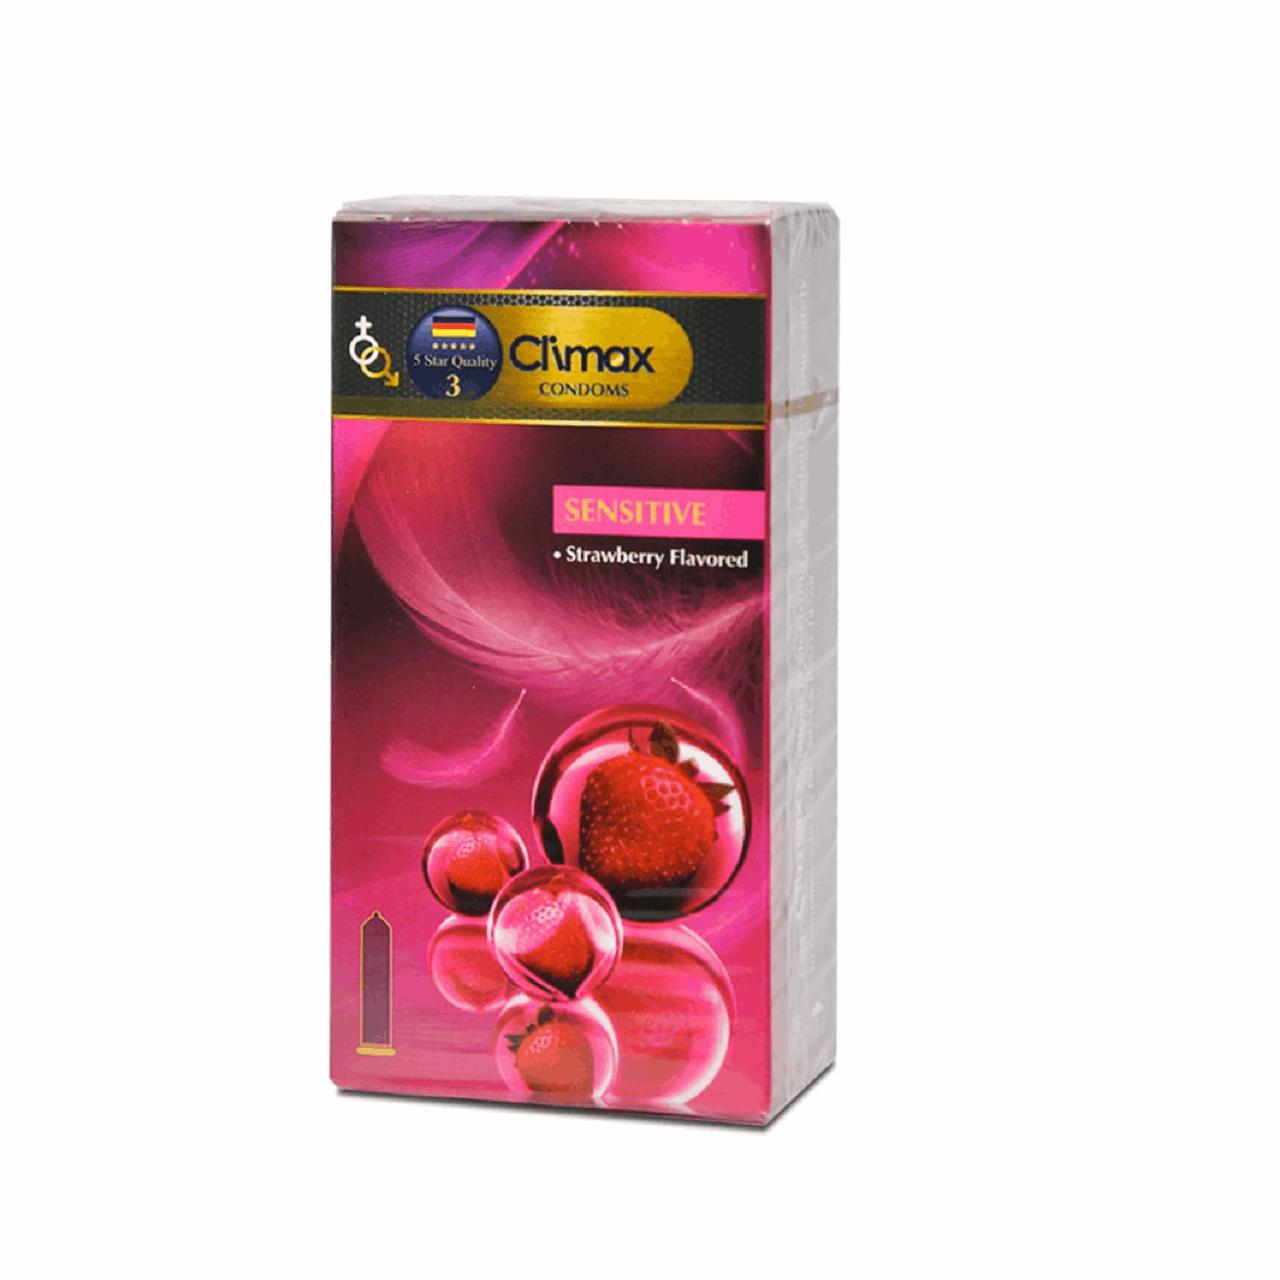 کاندوم کلایمکس مدل Sensitive 3 بسته 12 عددی